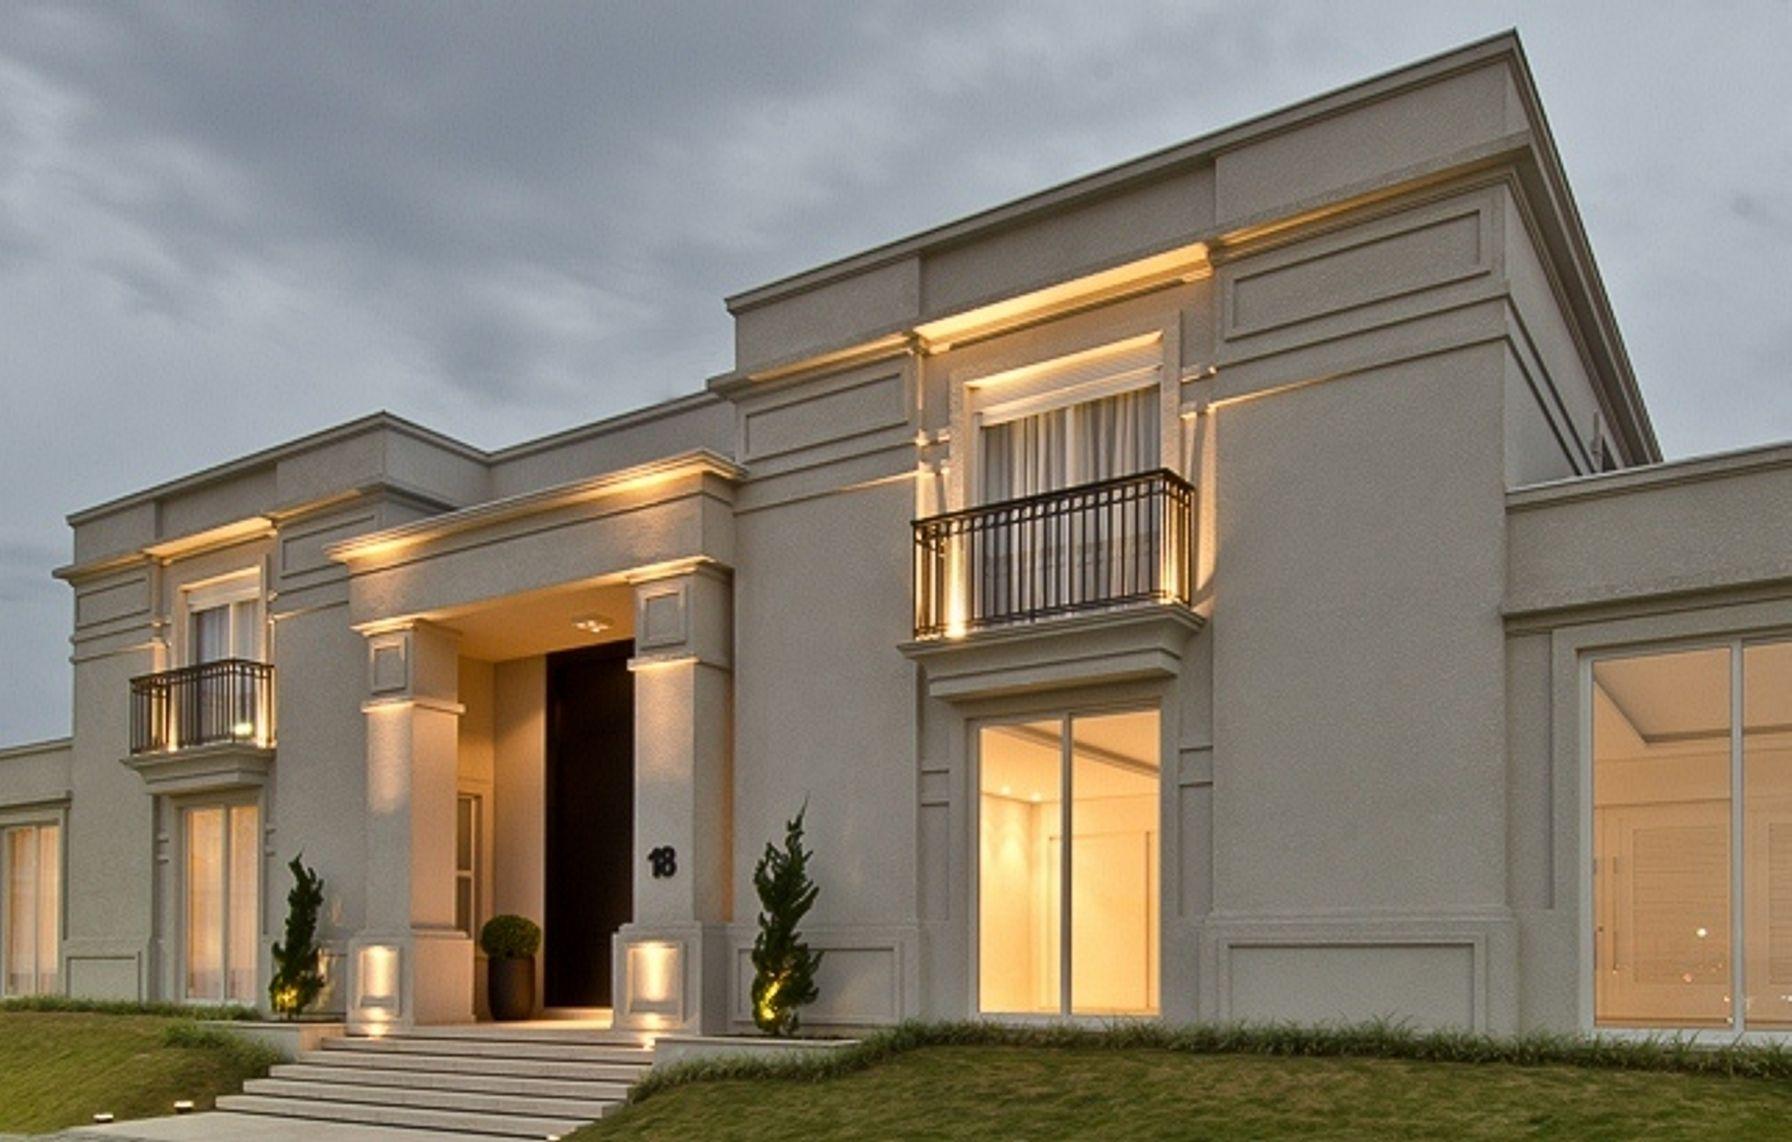 Casa boulevard 540m terceira pasta em 2019 e for Casa classica villa medici